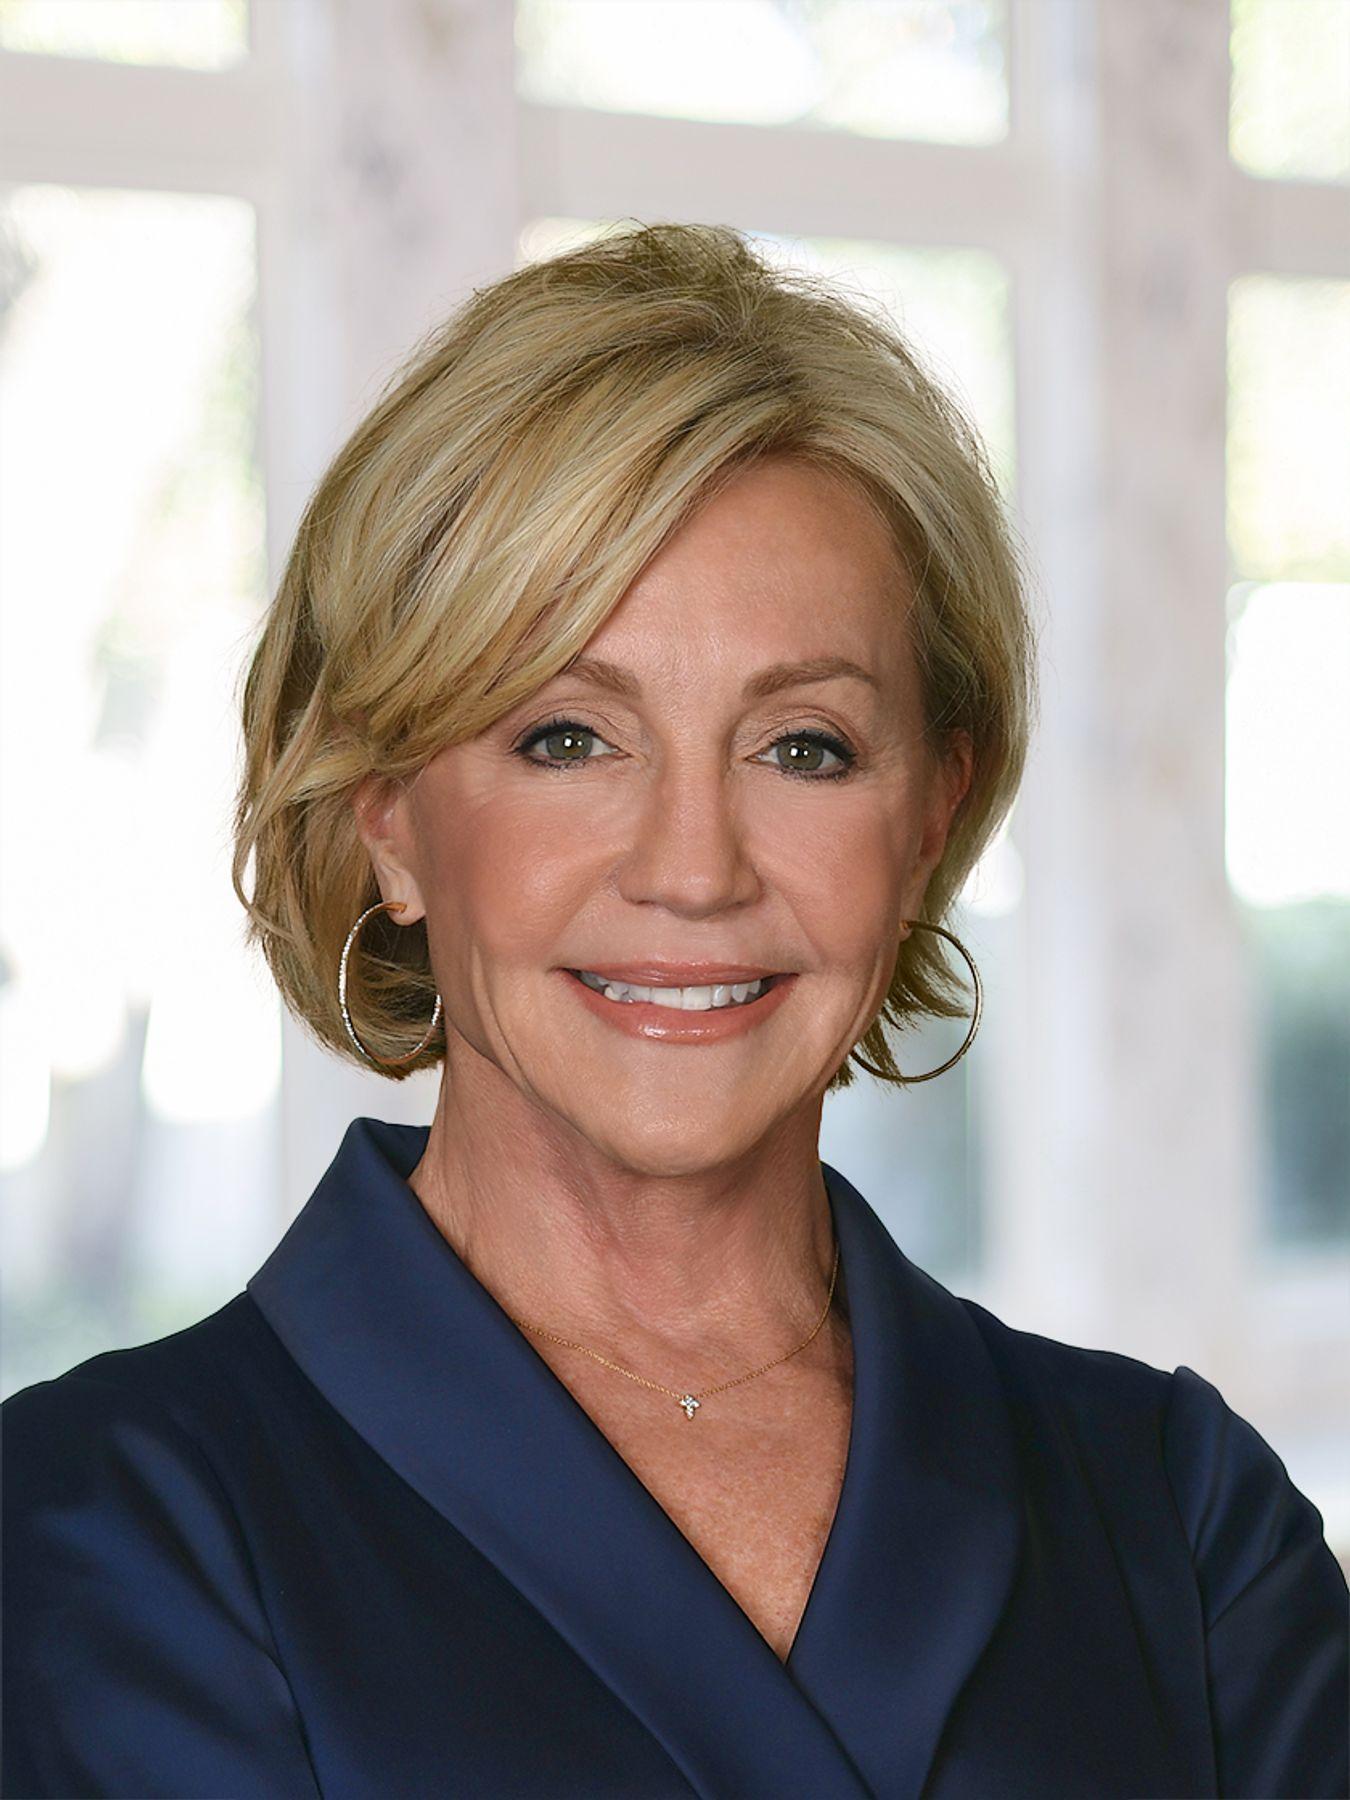 Cathy Derrick